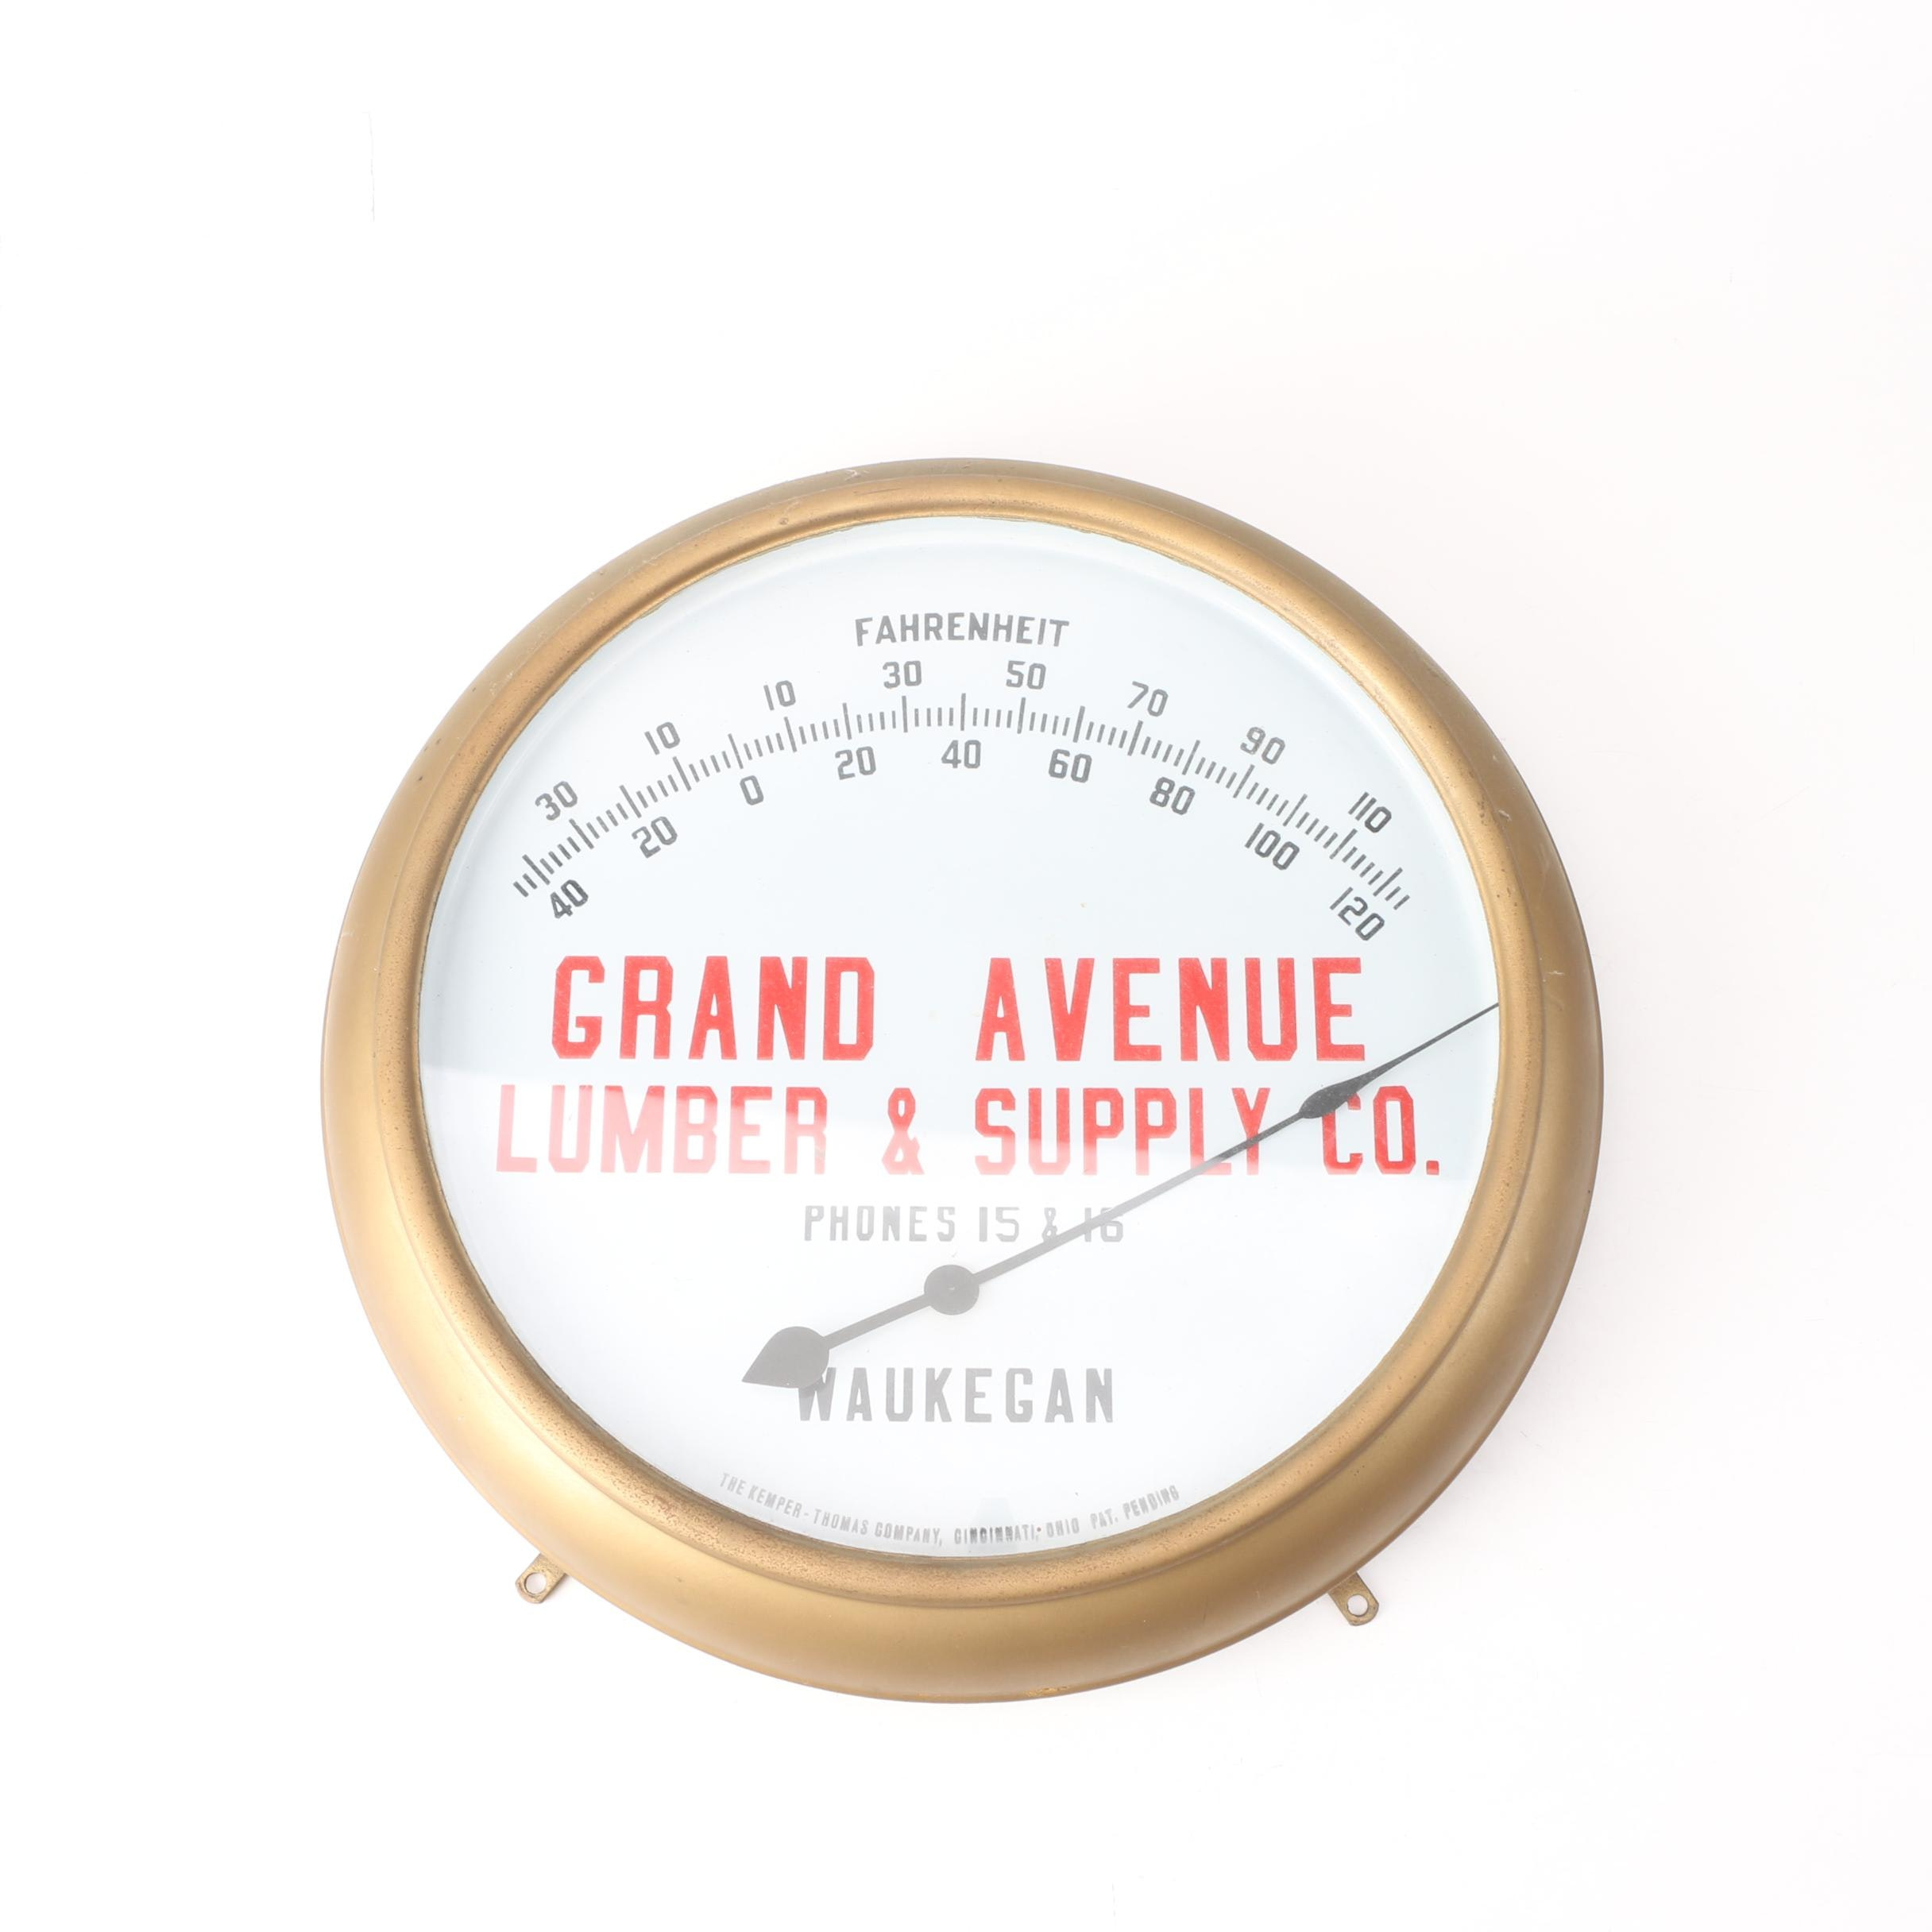 Kemper -Thomas Company Advertising Wall Thermometer